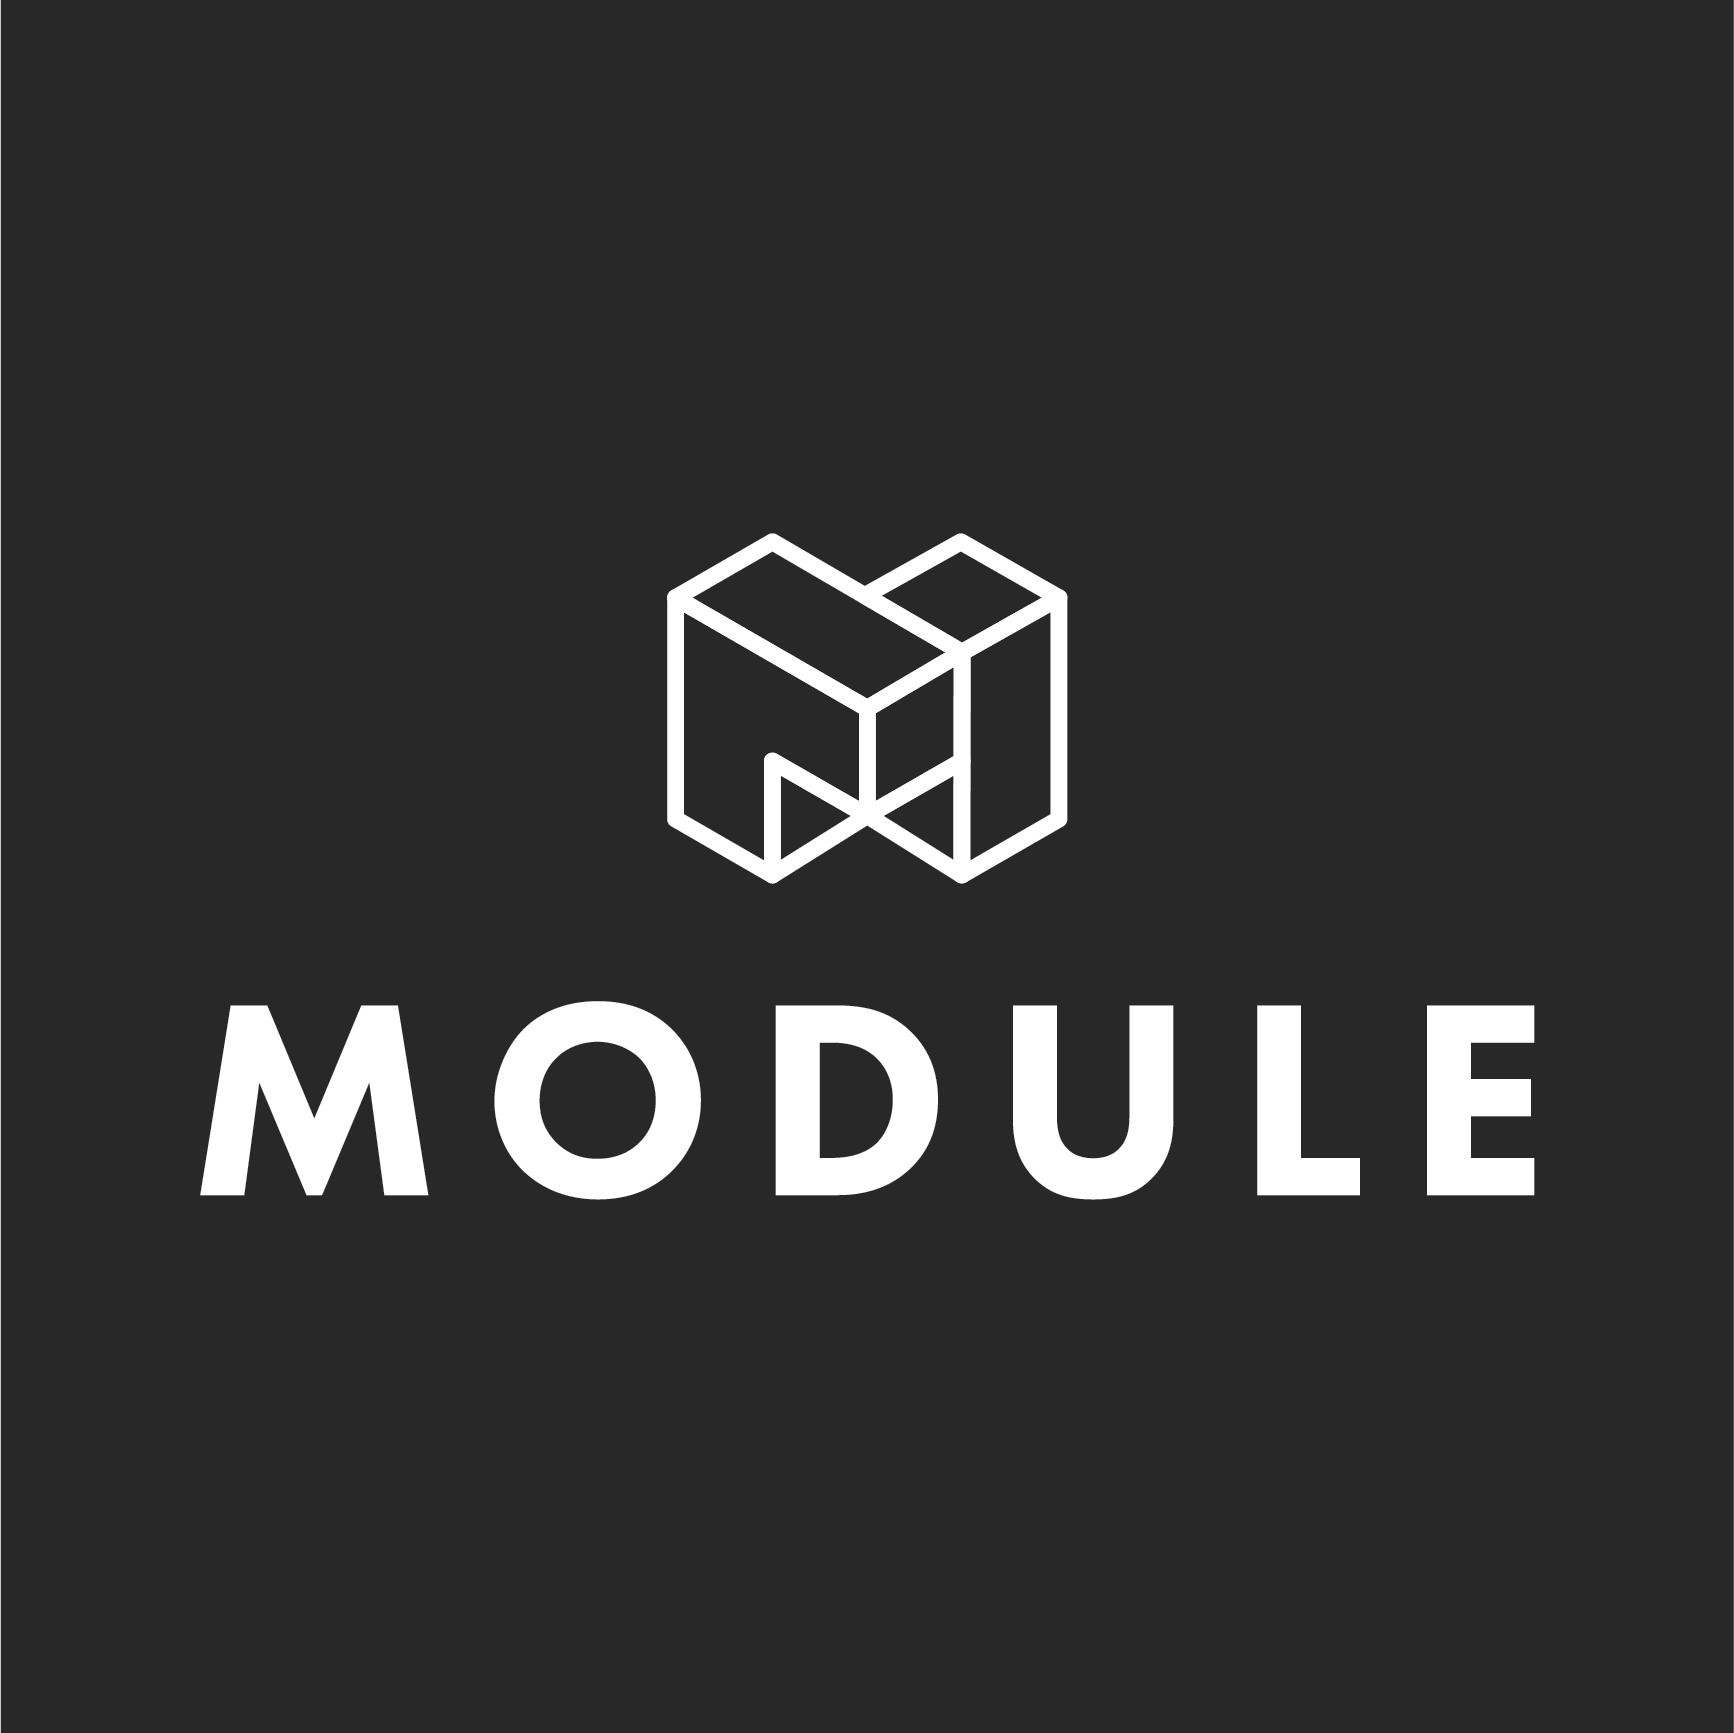 module_logo-15.png